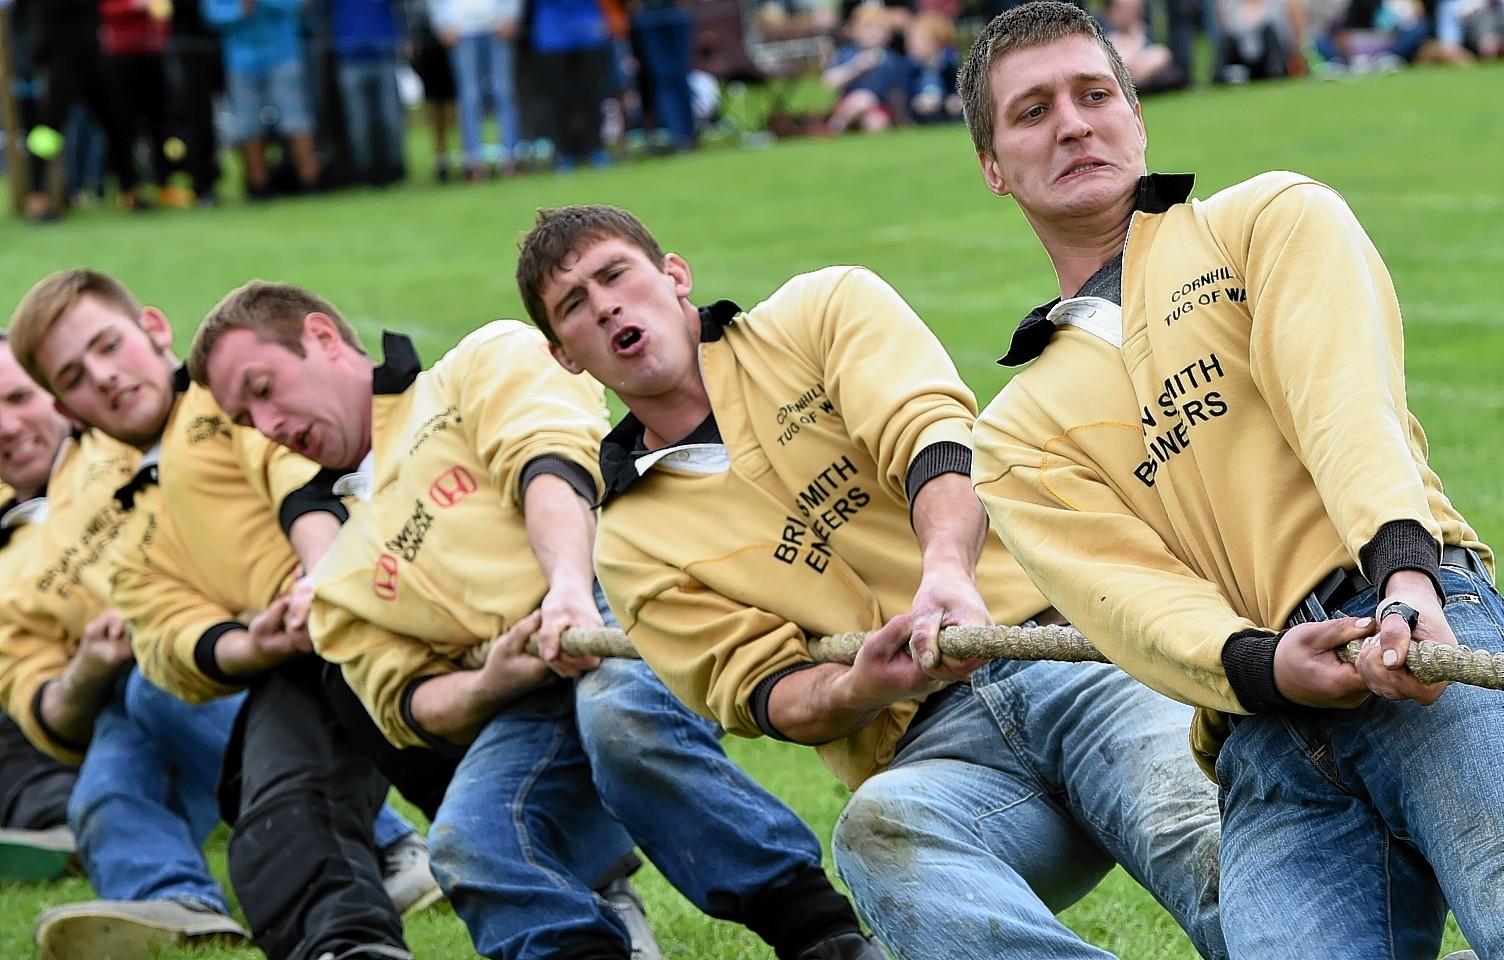 Tug o' war at Aboyne Highland Games. Credit: Kenny Elrick.